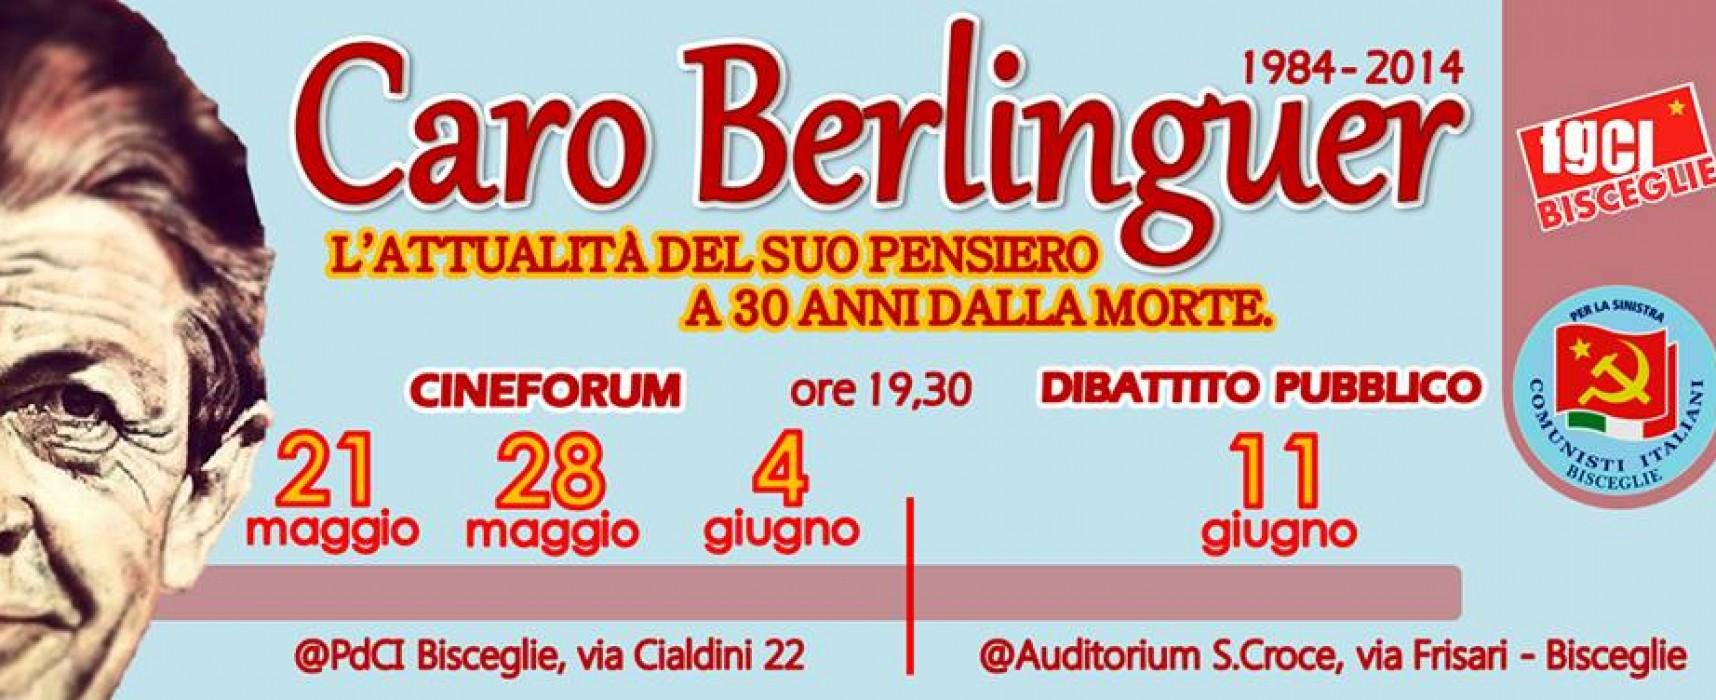 PDCI Bisceglie, cineforum in memoria di Enrico Berlinguer